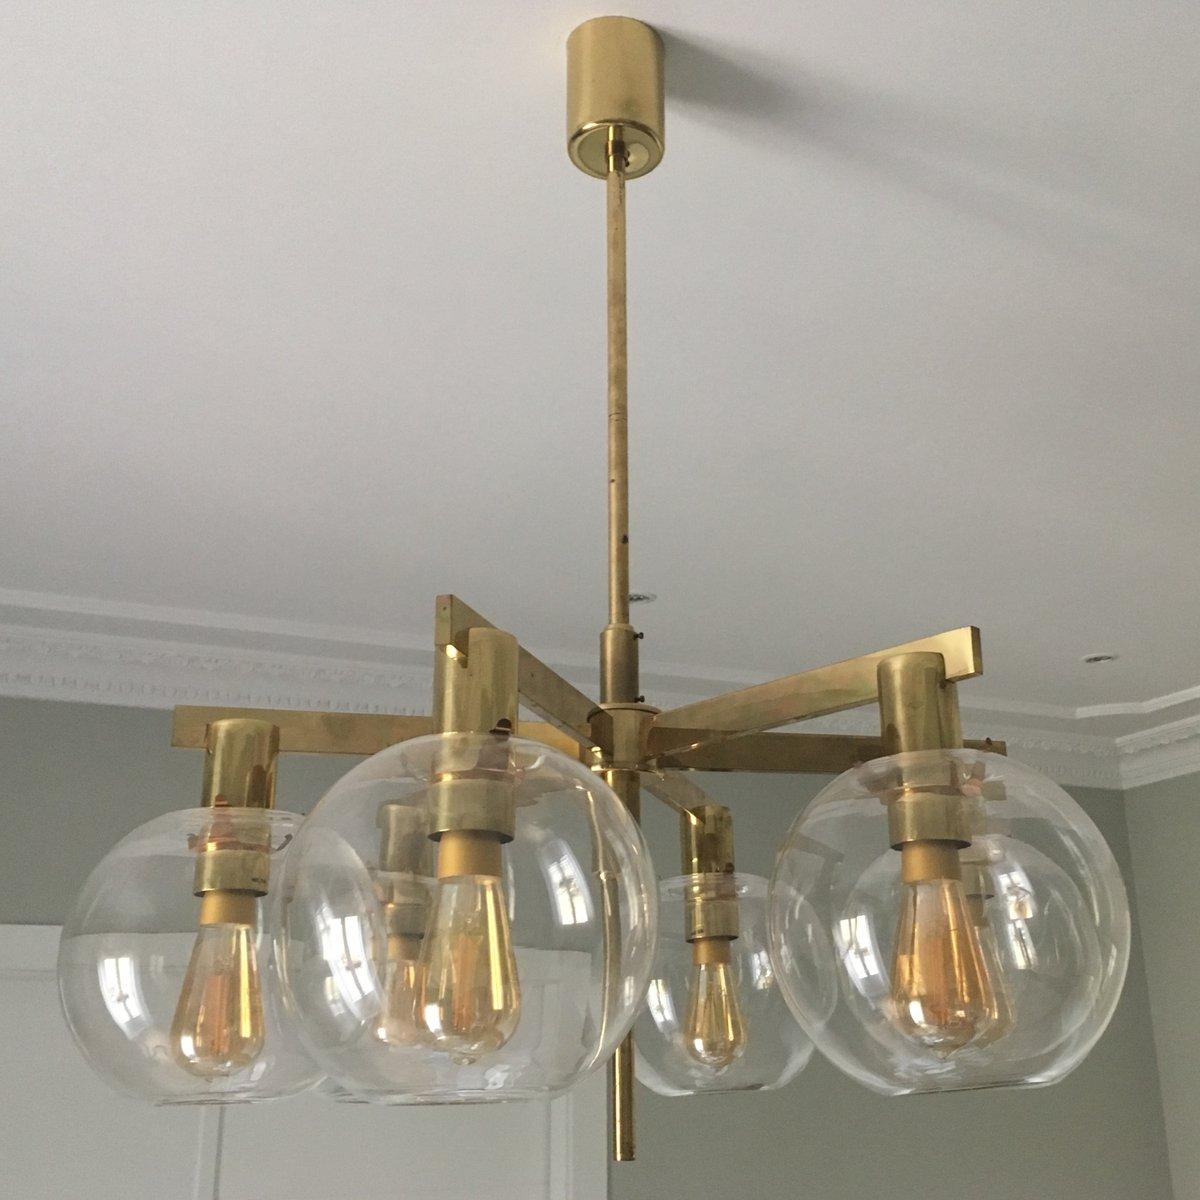 light n arag lights decorativas pinterest bombillas zaragoza pin globes en